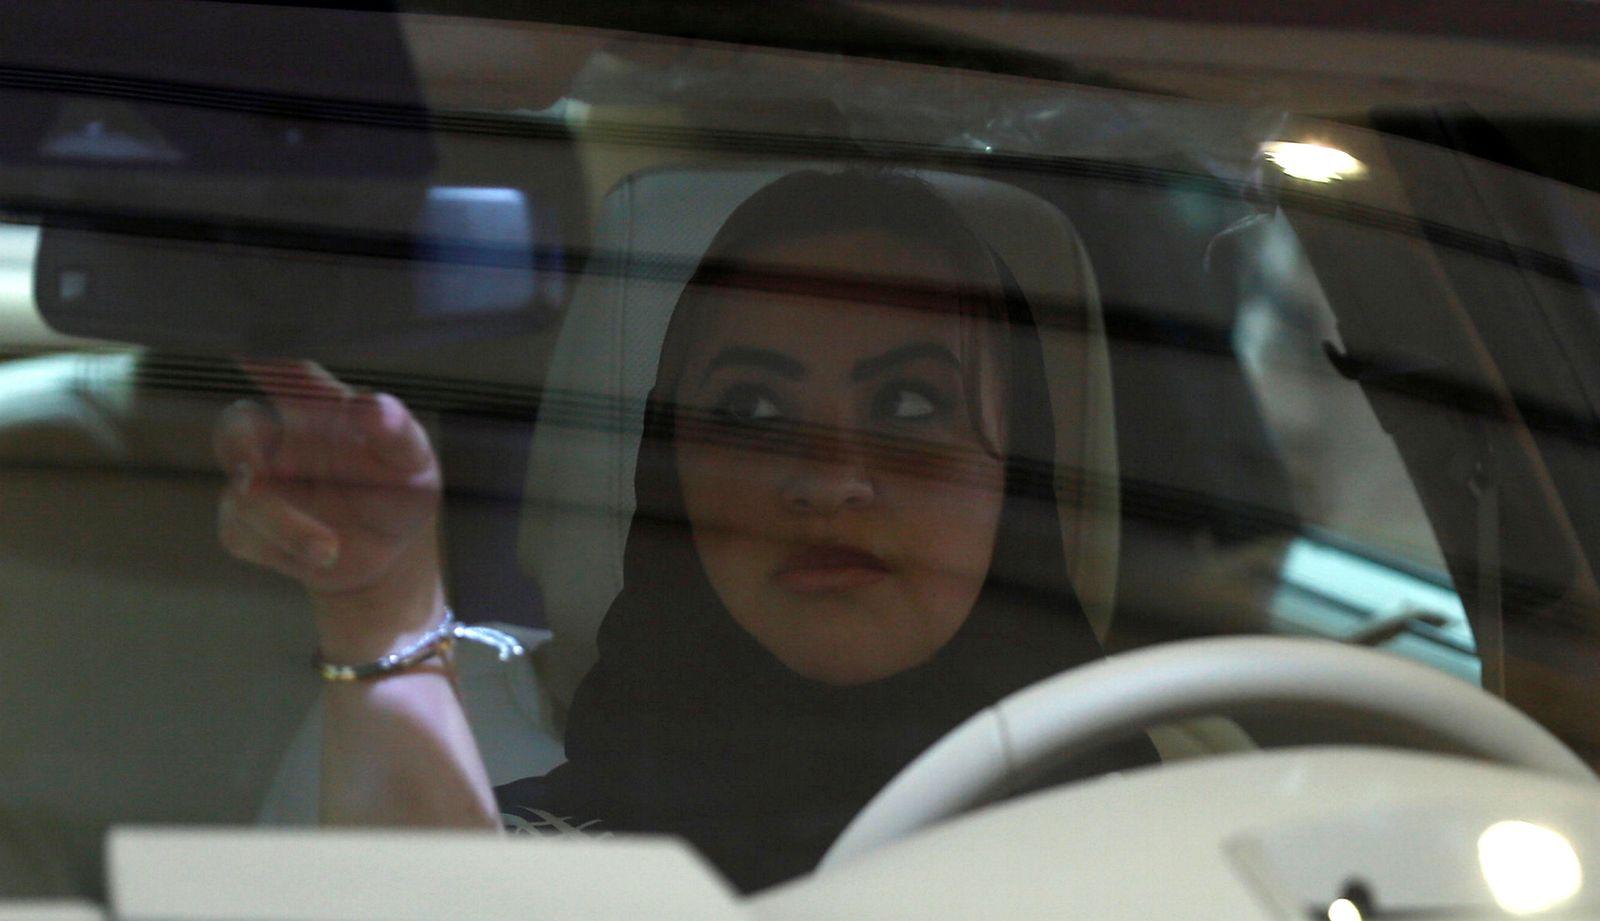 SAUDI-WOMEN/DRIVING-POLITICS